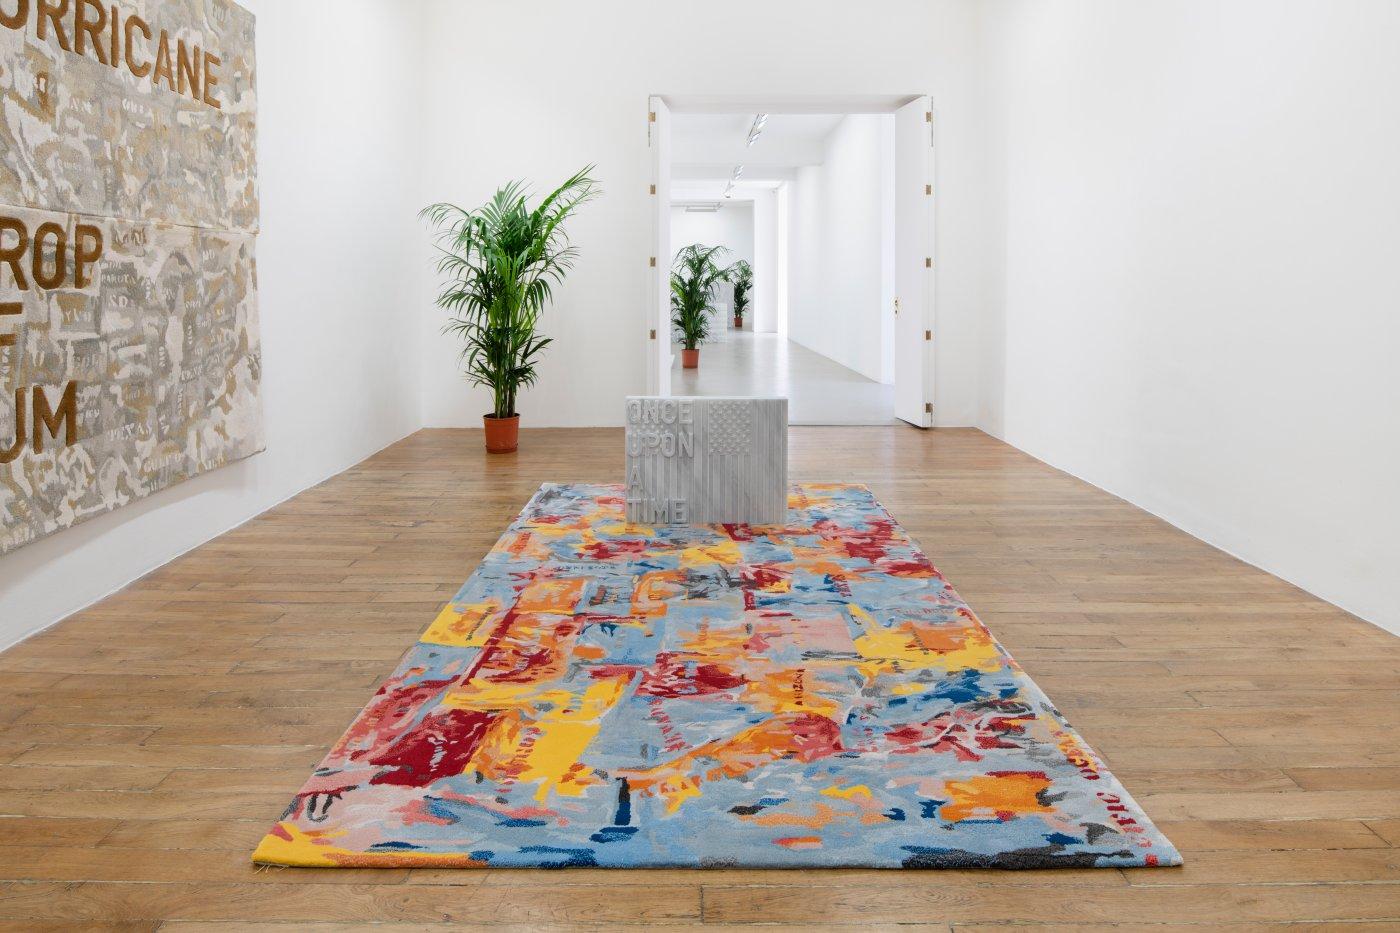 Galerie Chantal Crousel Rirkrit Tiravanija 4